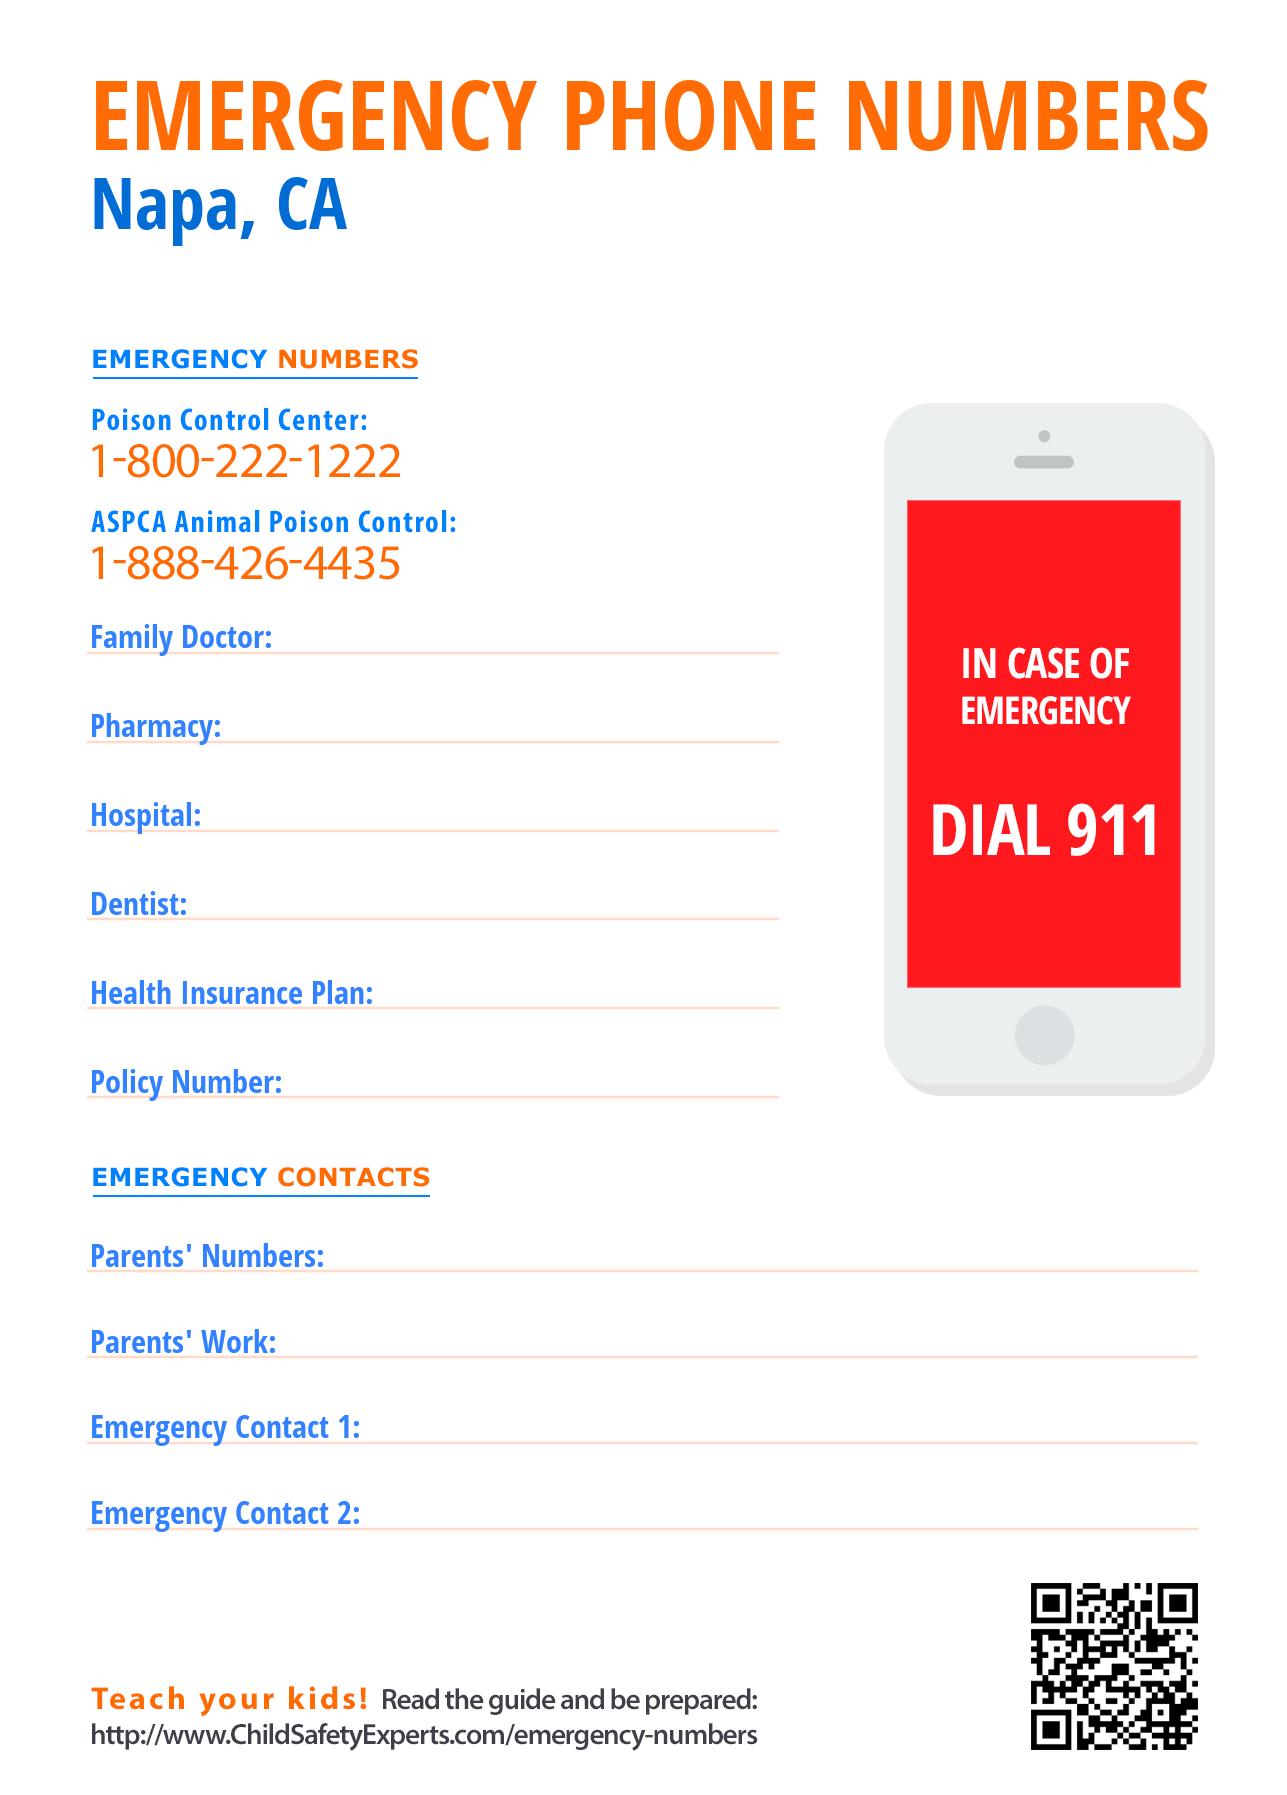 Important emergency phone numbers in Napa, California